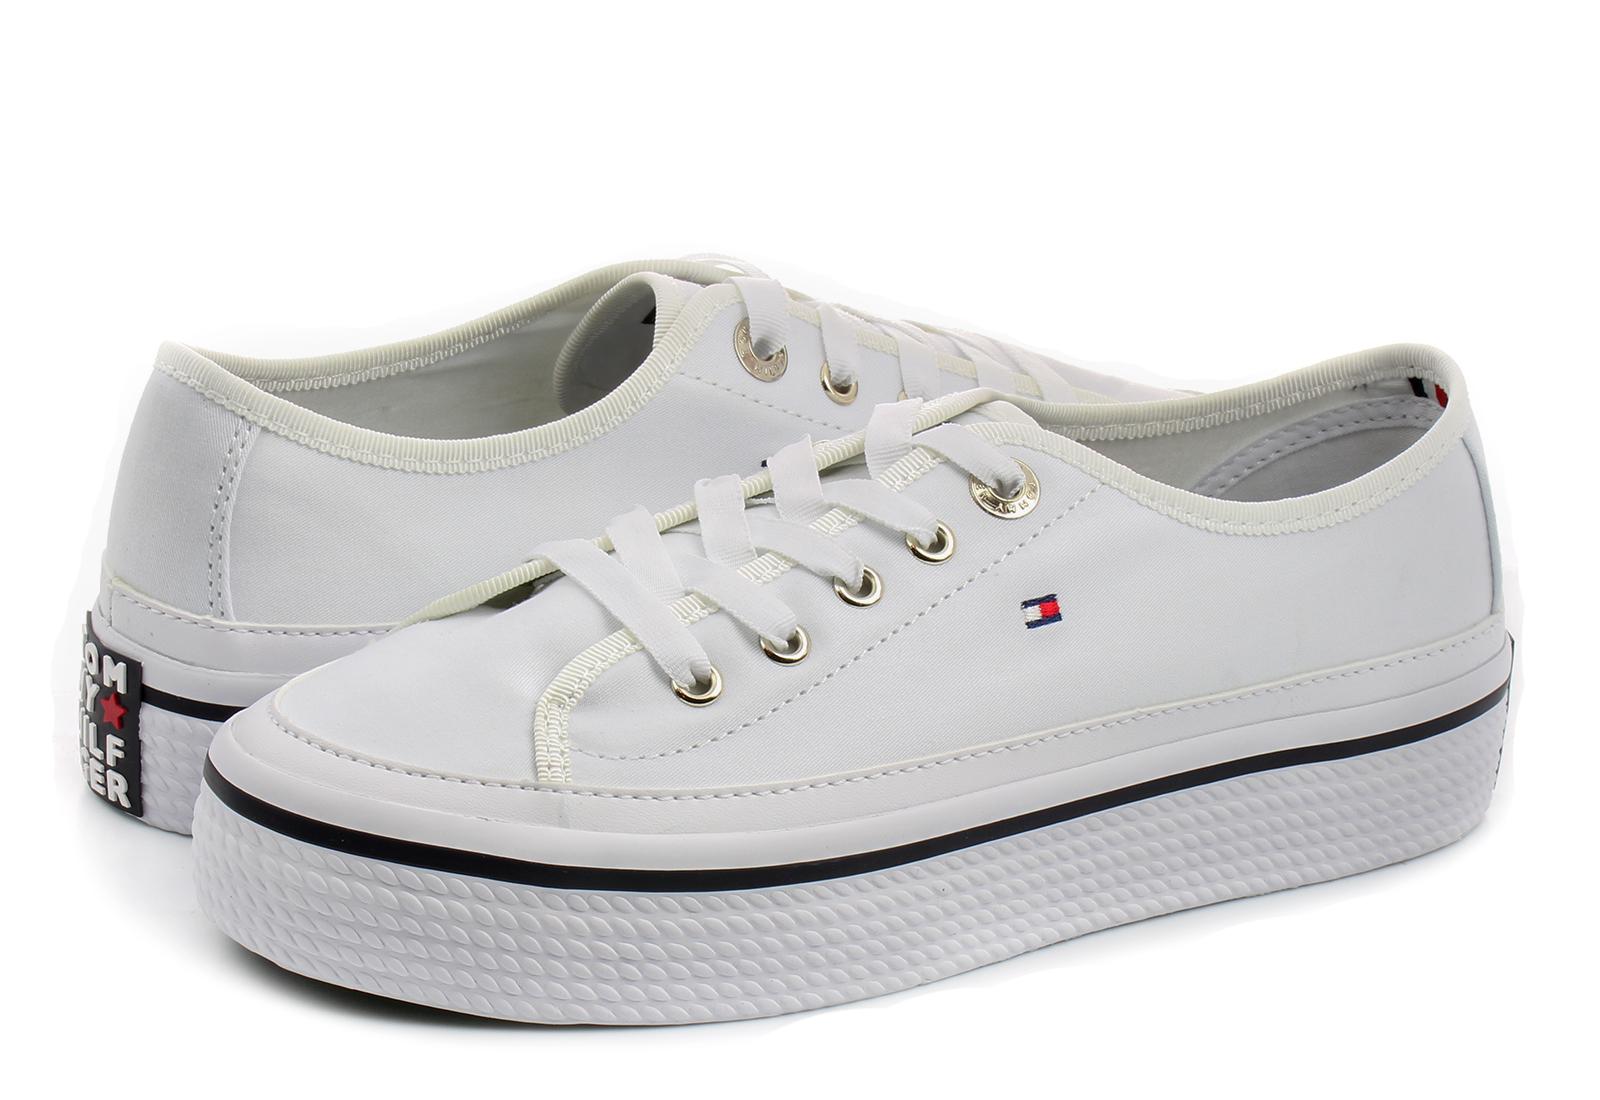 94bc0360e5 Tommy Hilfiger Cipő - Kelsey 1 - 18S-2456-100 - Office Shoes ...